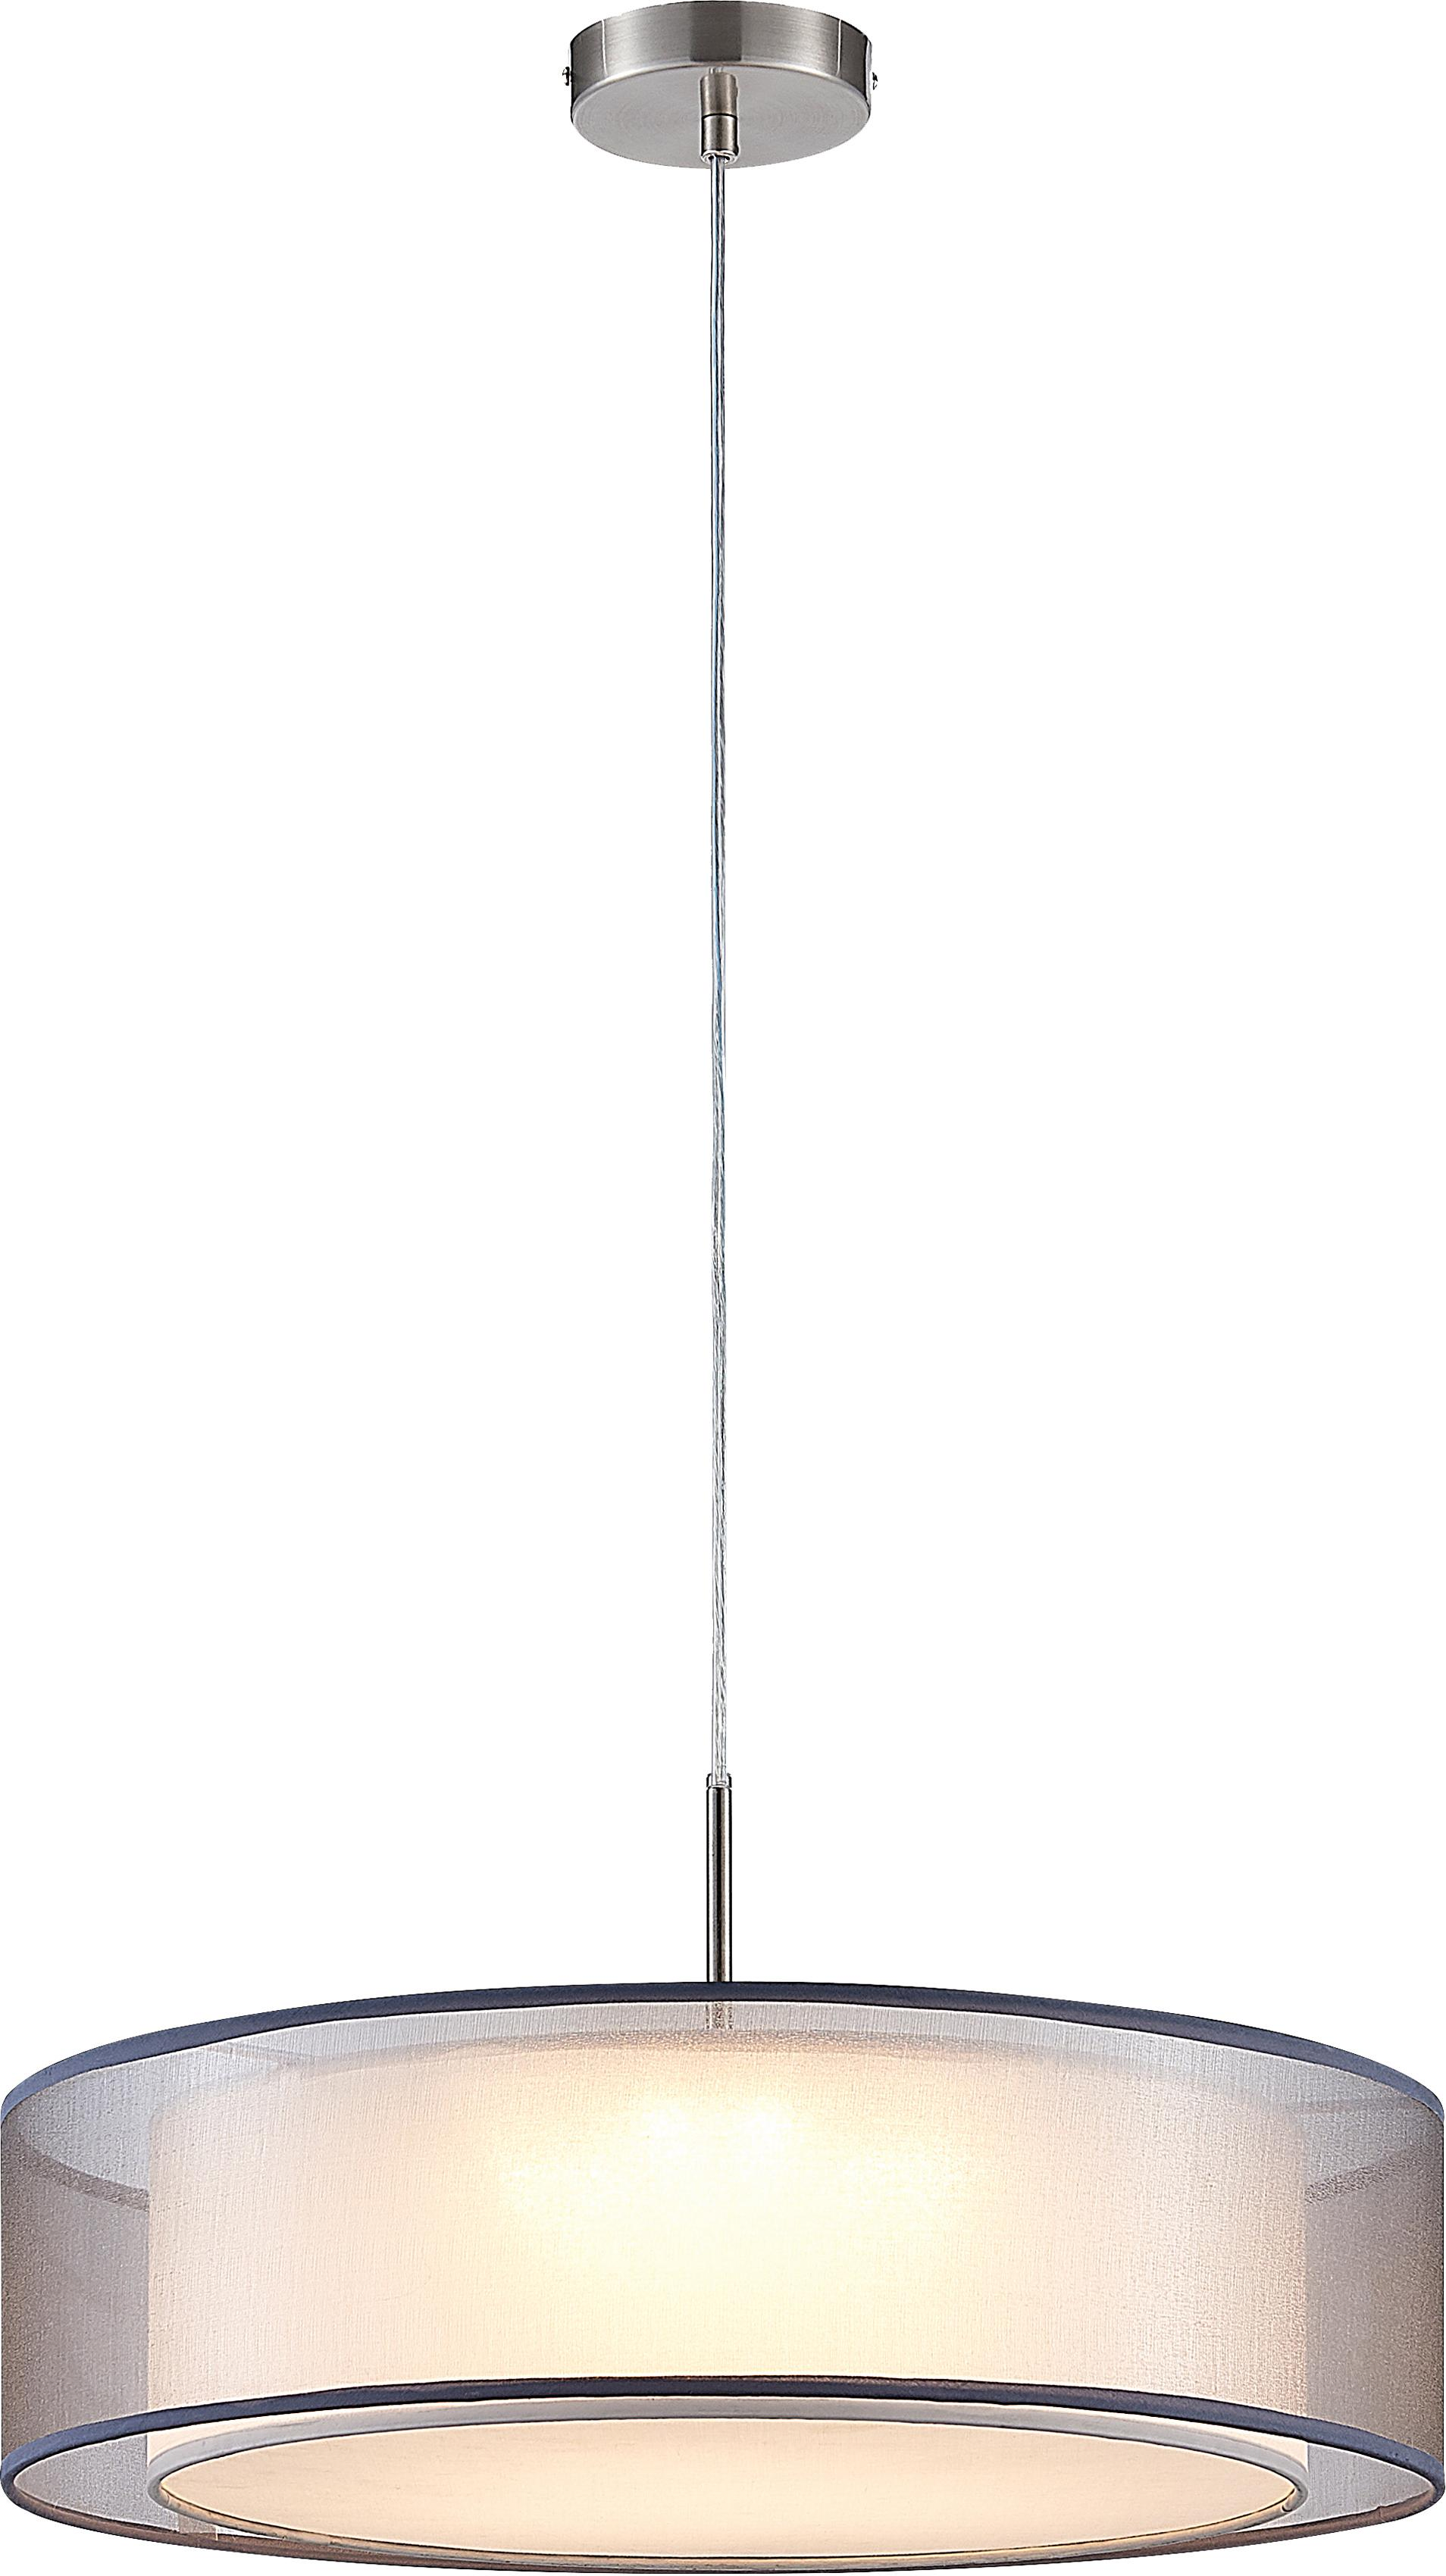 Nino Leuchten LED Pendelleuchte CHLOE, LED-Board, Warmweiß, LED Hängelampe, LED Hängeleuchte